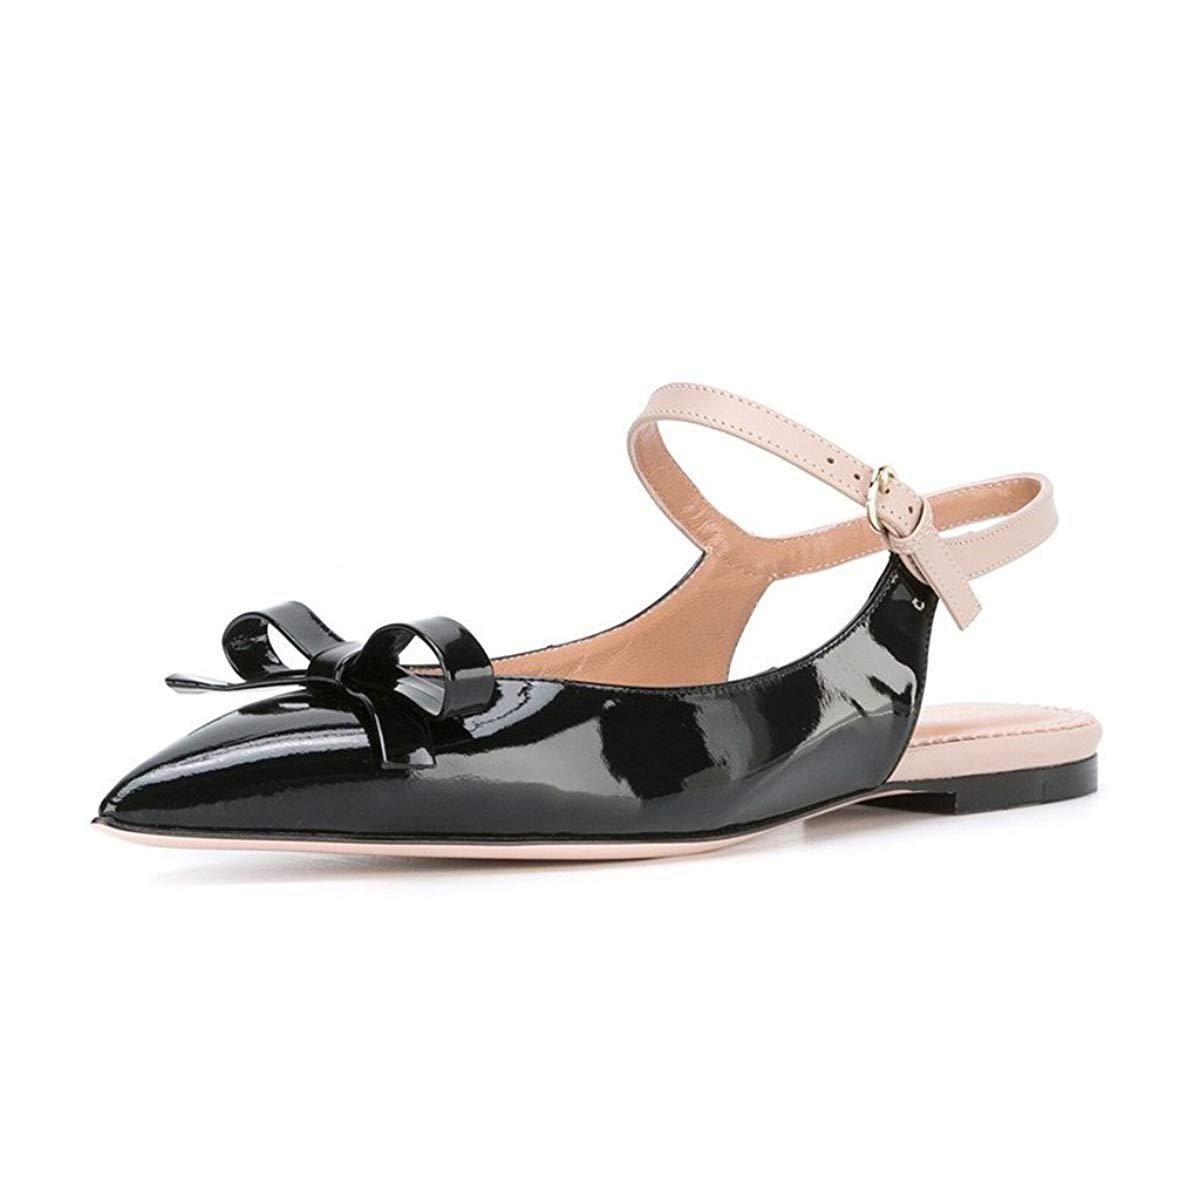 XYD Office Trendy Dress Slingback Flats Pointy Toe Bows Sandals Slip On Pumps Shoes for Women B072DWJK7B 5 B(M) US Black